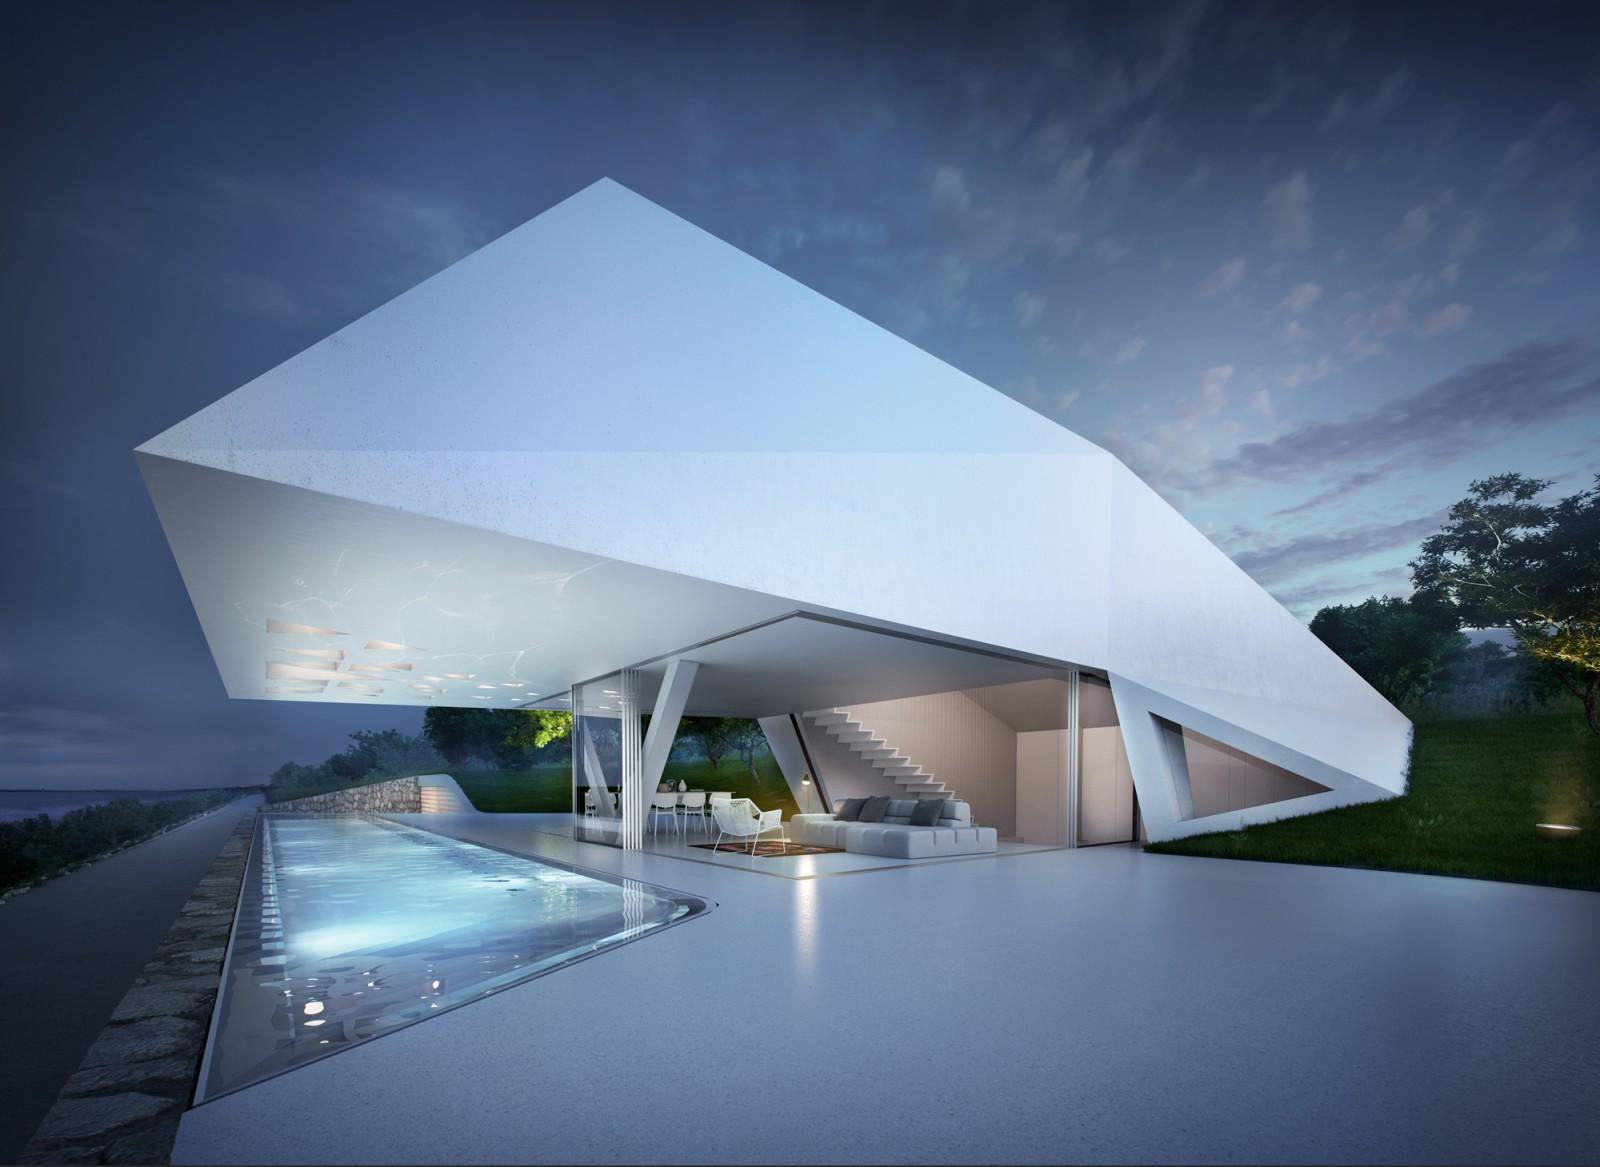 Villa-F-in-Rhodes-Greece-1-640x467.jpg